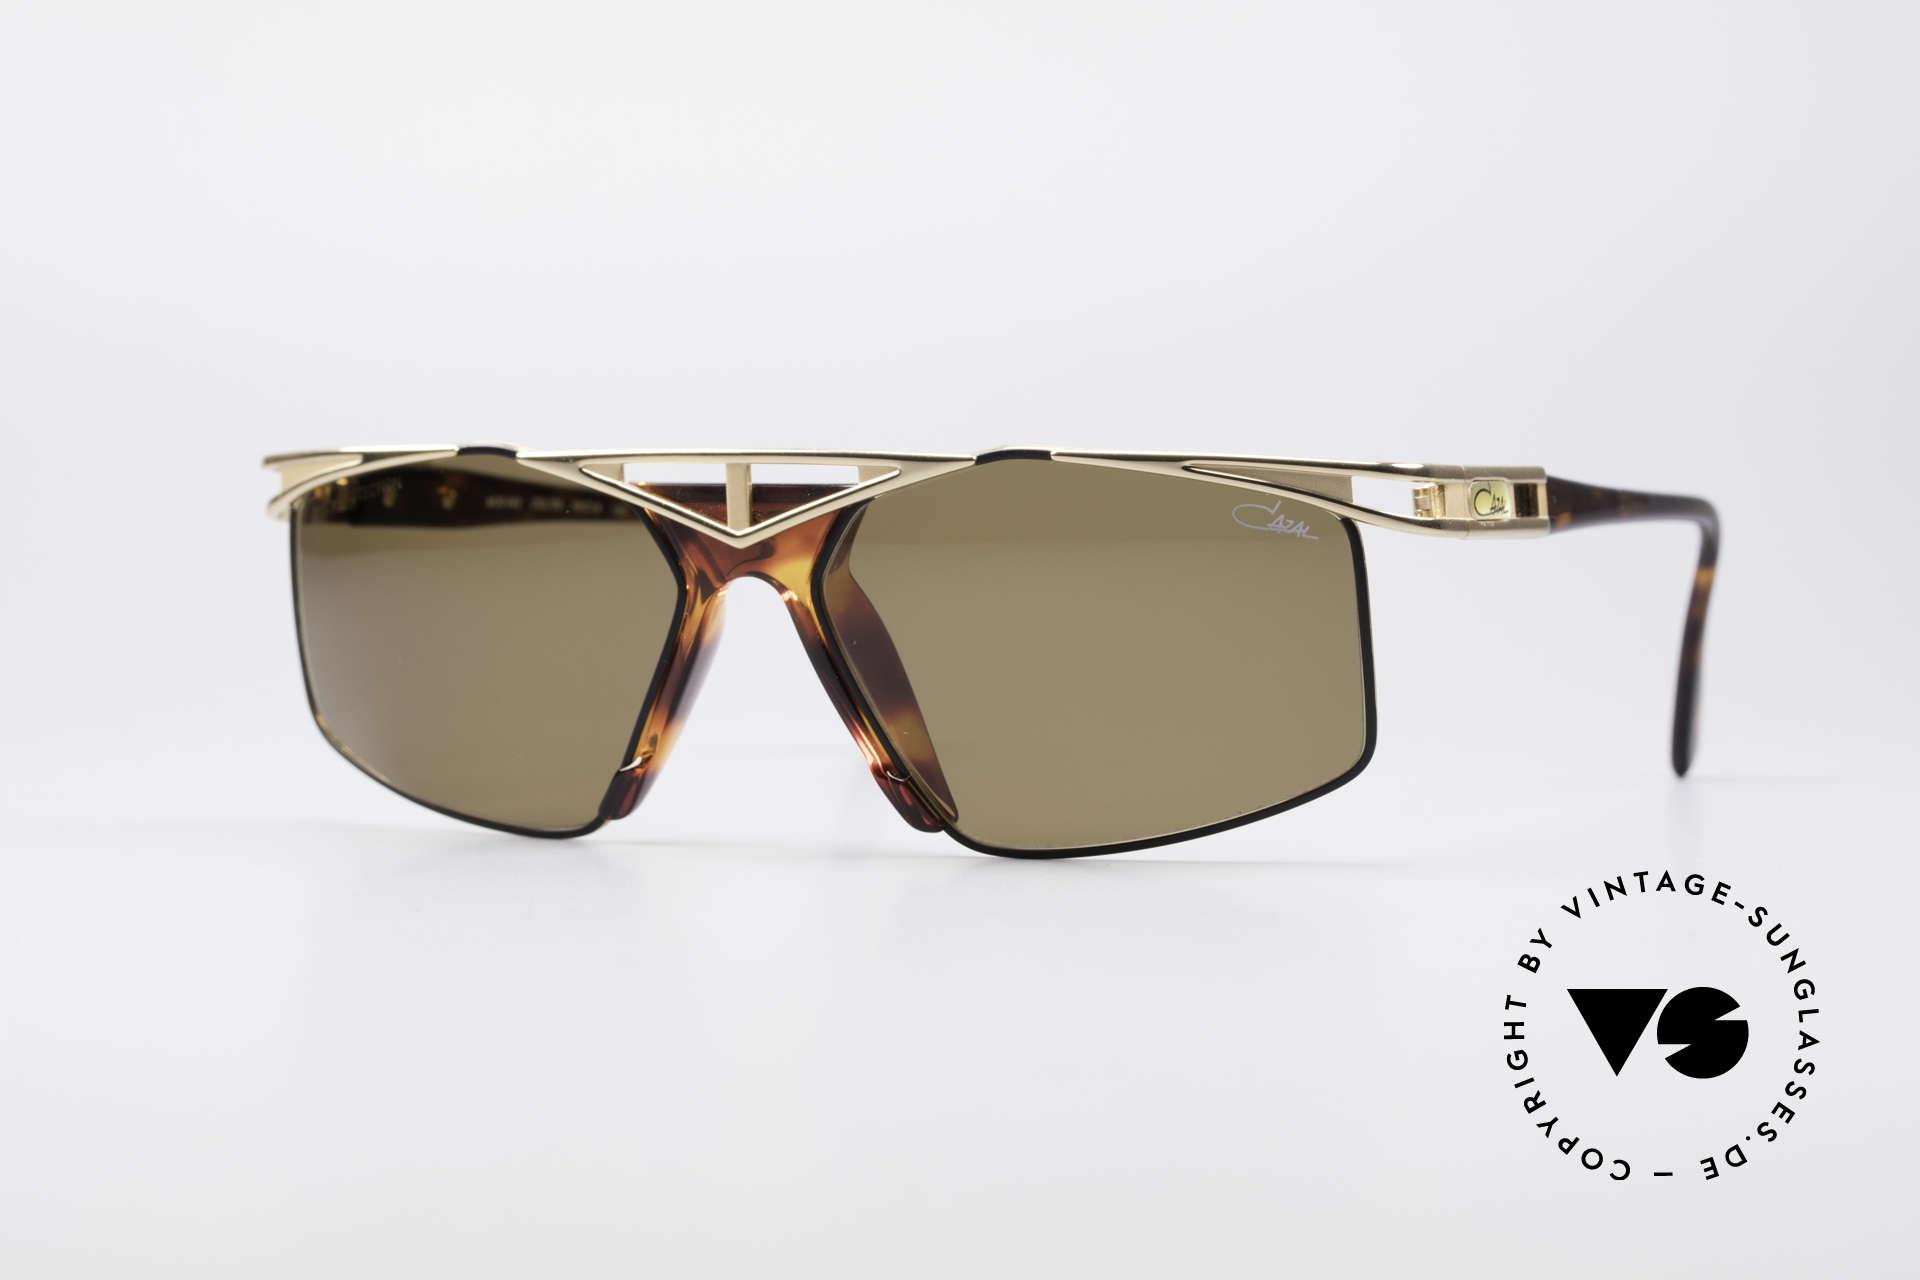 cb6adce8e13 Sunglasses Cazal 962 90s Designer Sunglasses